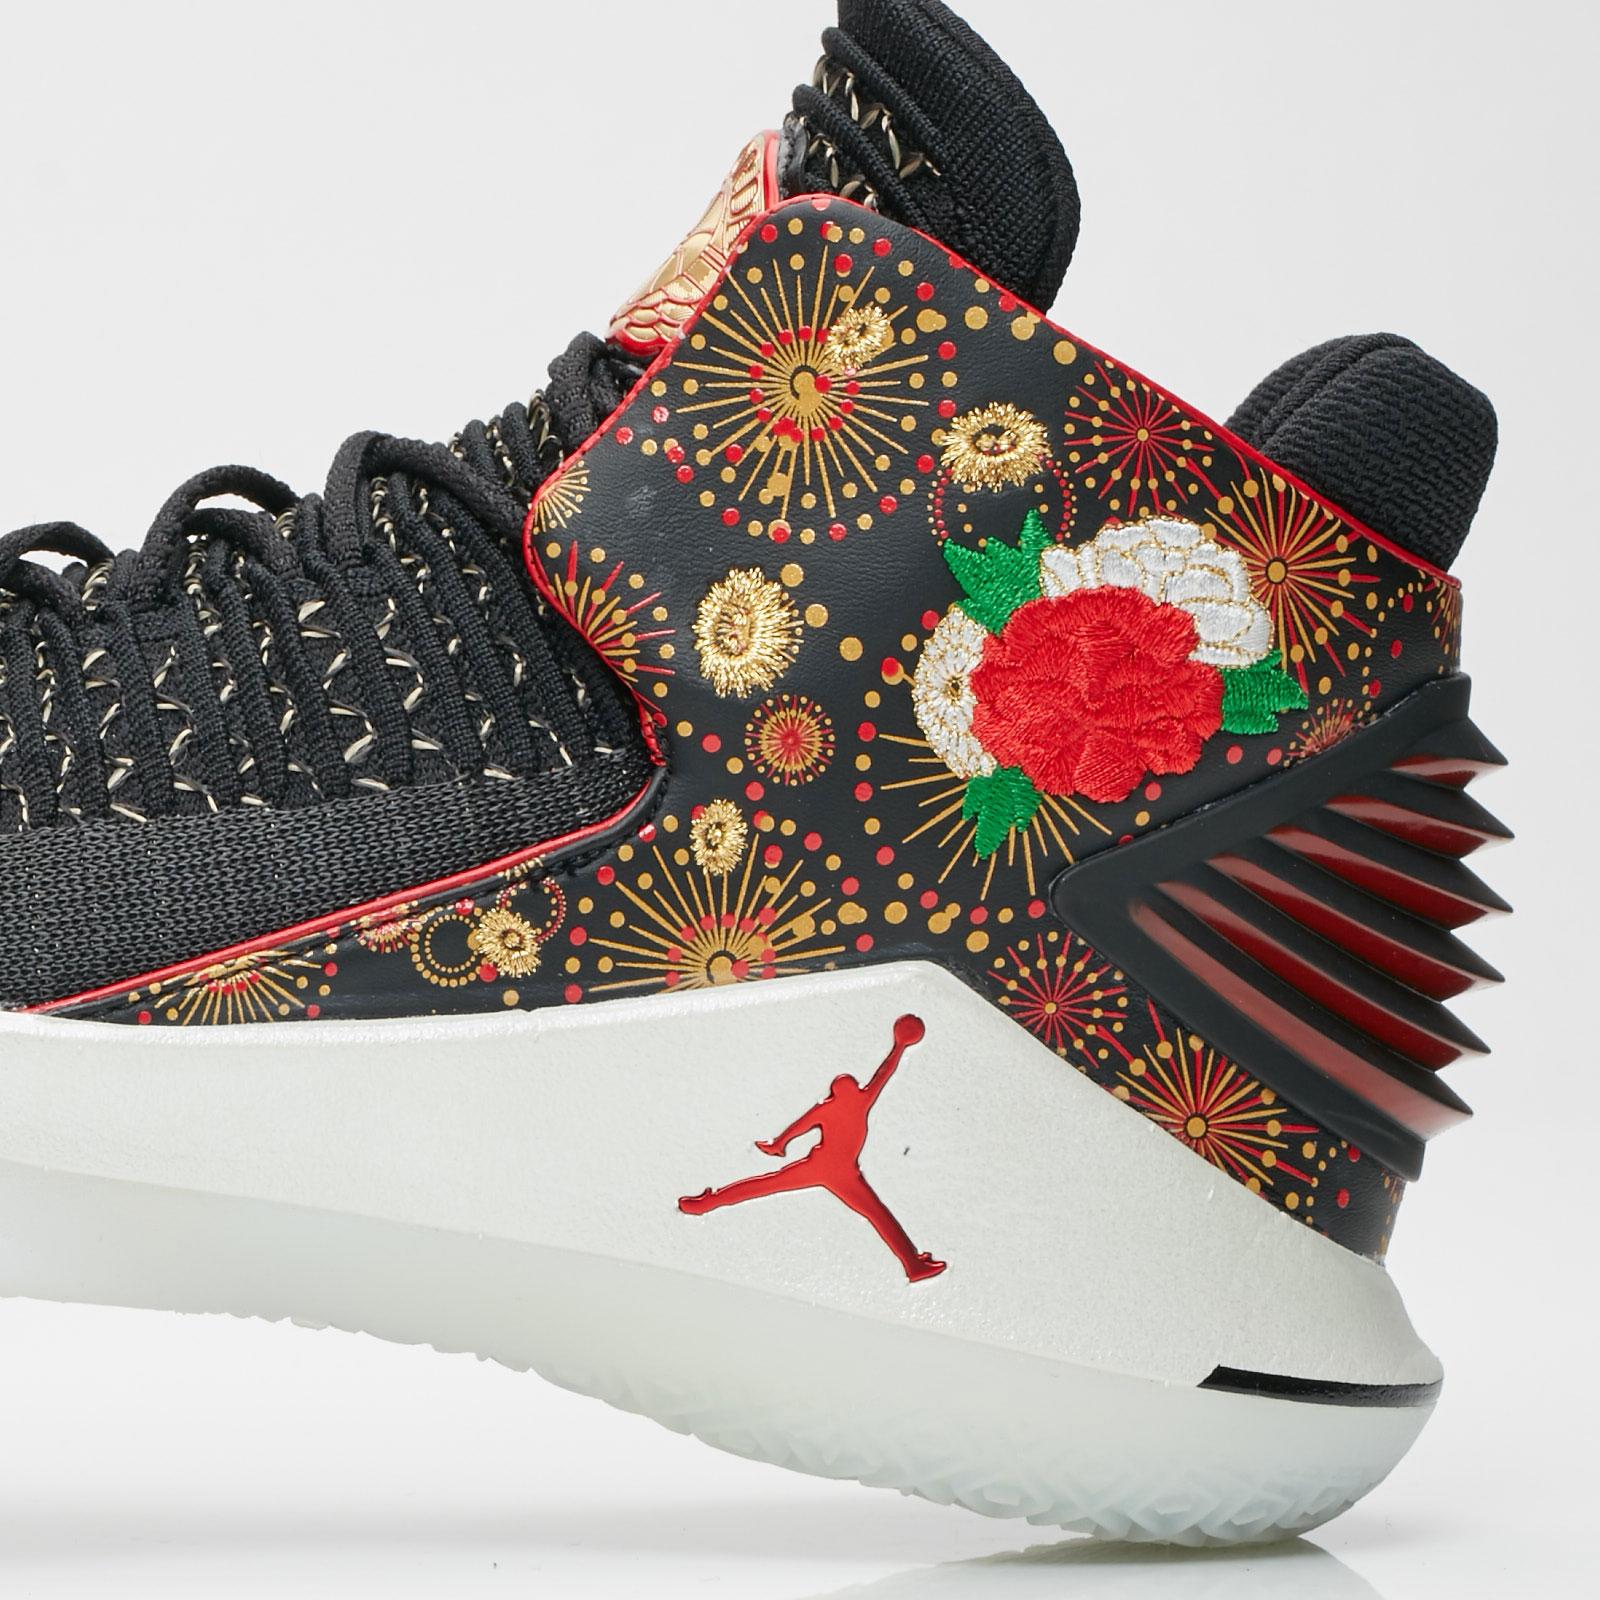 Jordan Brand Air Jordan XXXII CNY